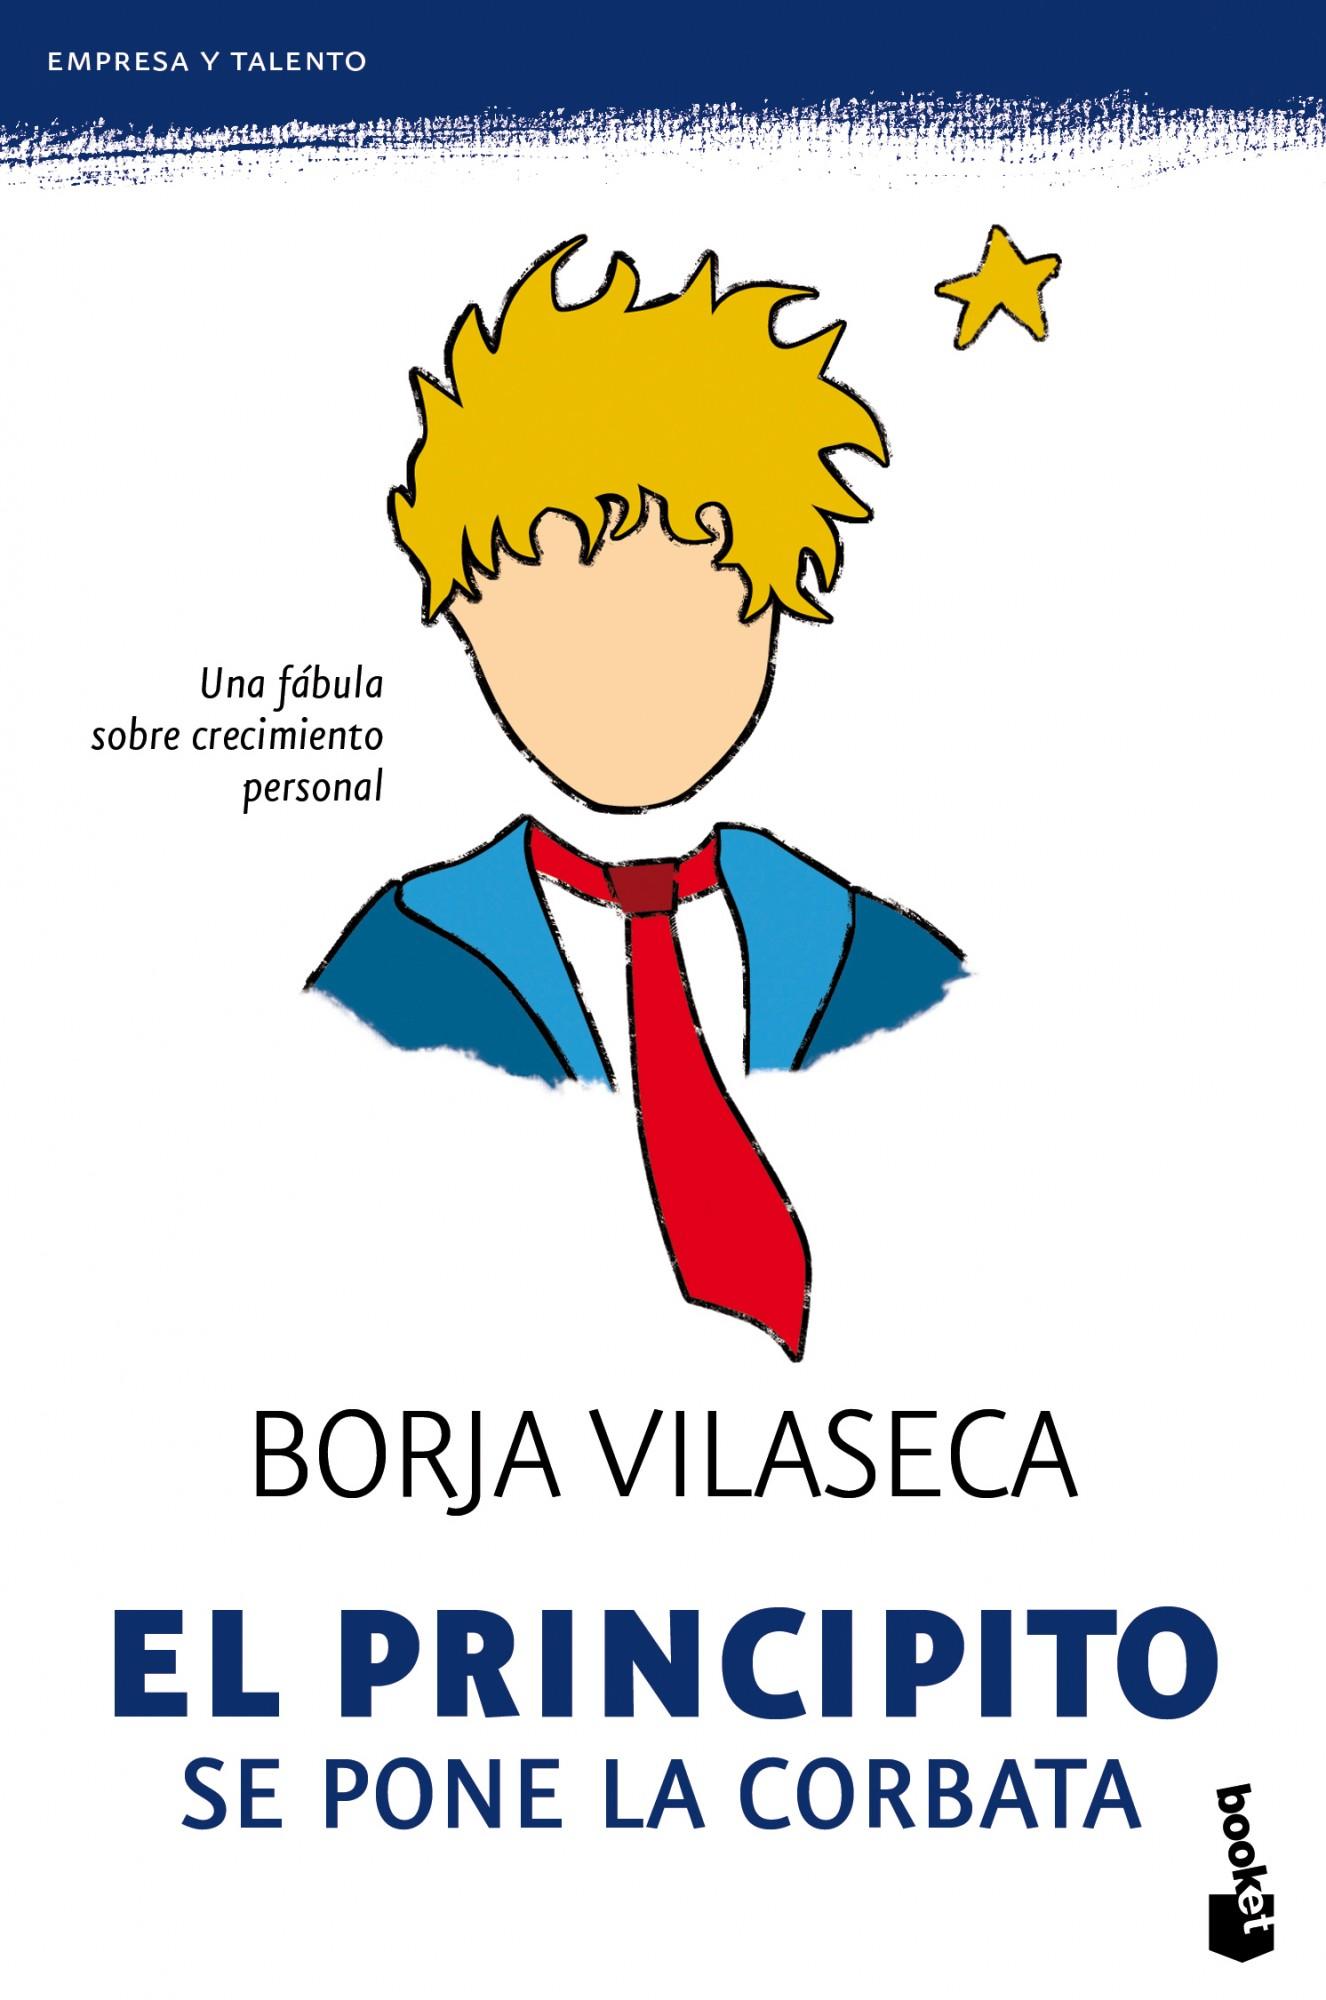 libro-el-principito-se-pone-la-corbata-borja-vilaseca